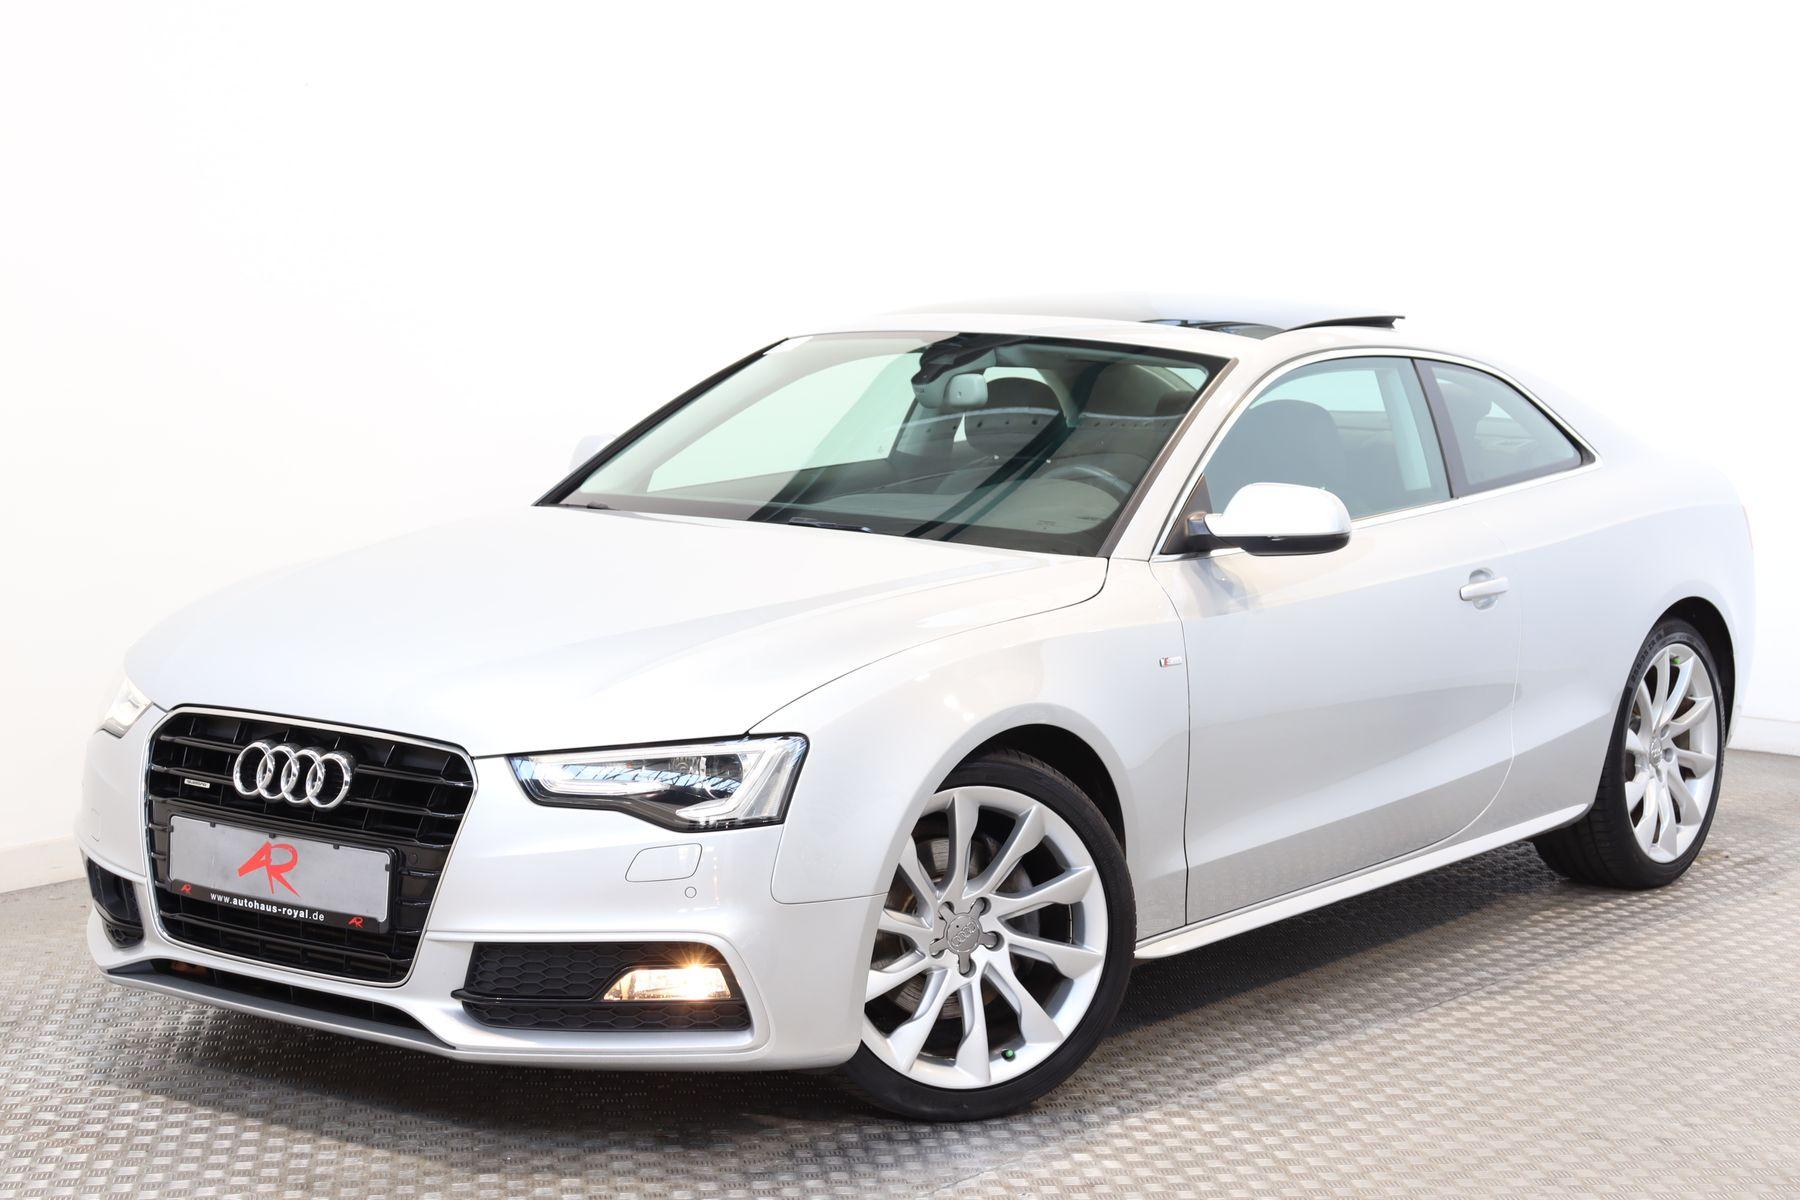 Audi A5 Coupe 3.0 TDI qu S LINE ACC,PANO,MEMORY,1.HD, Jahr 2013, Diesel